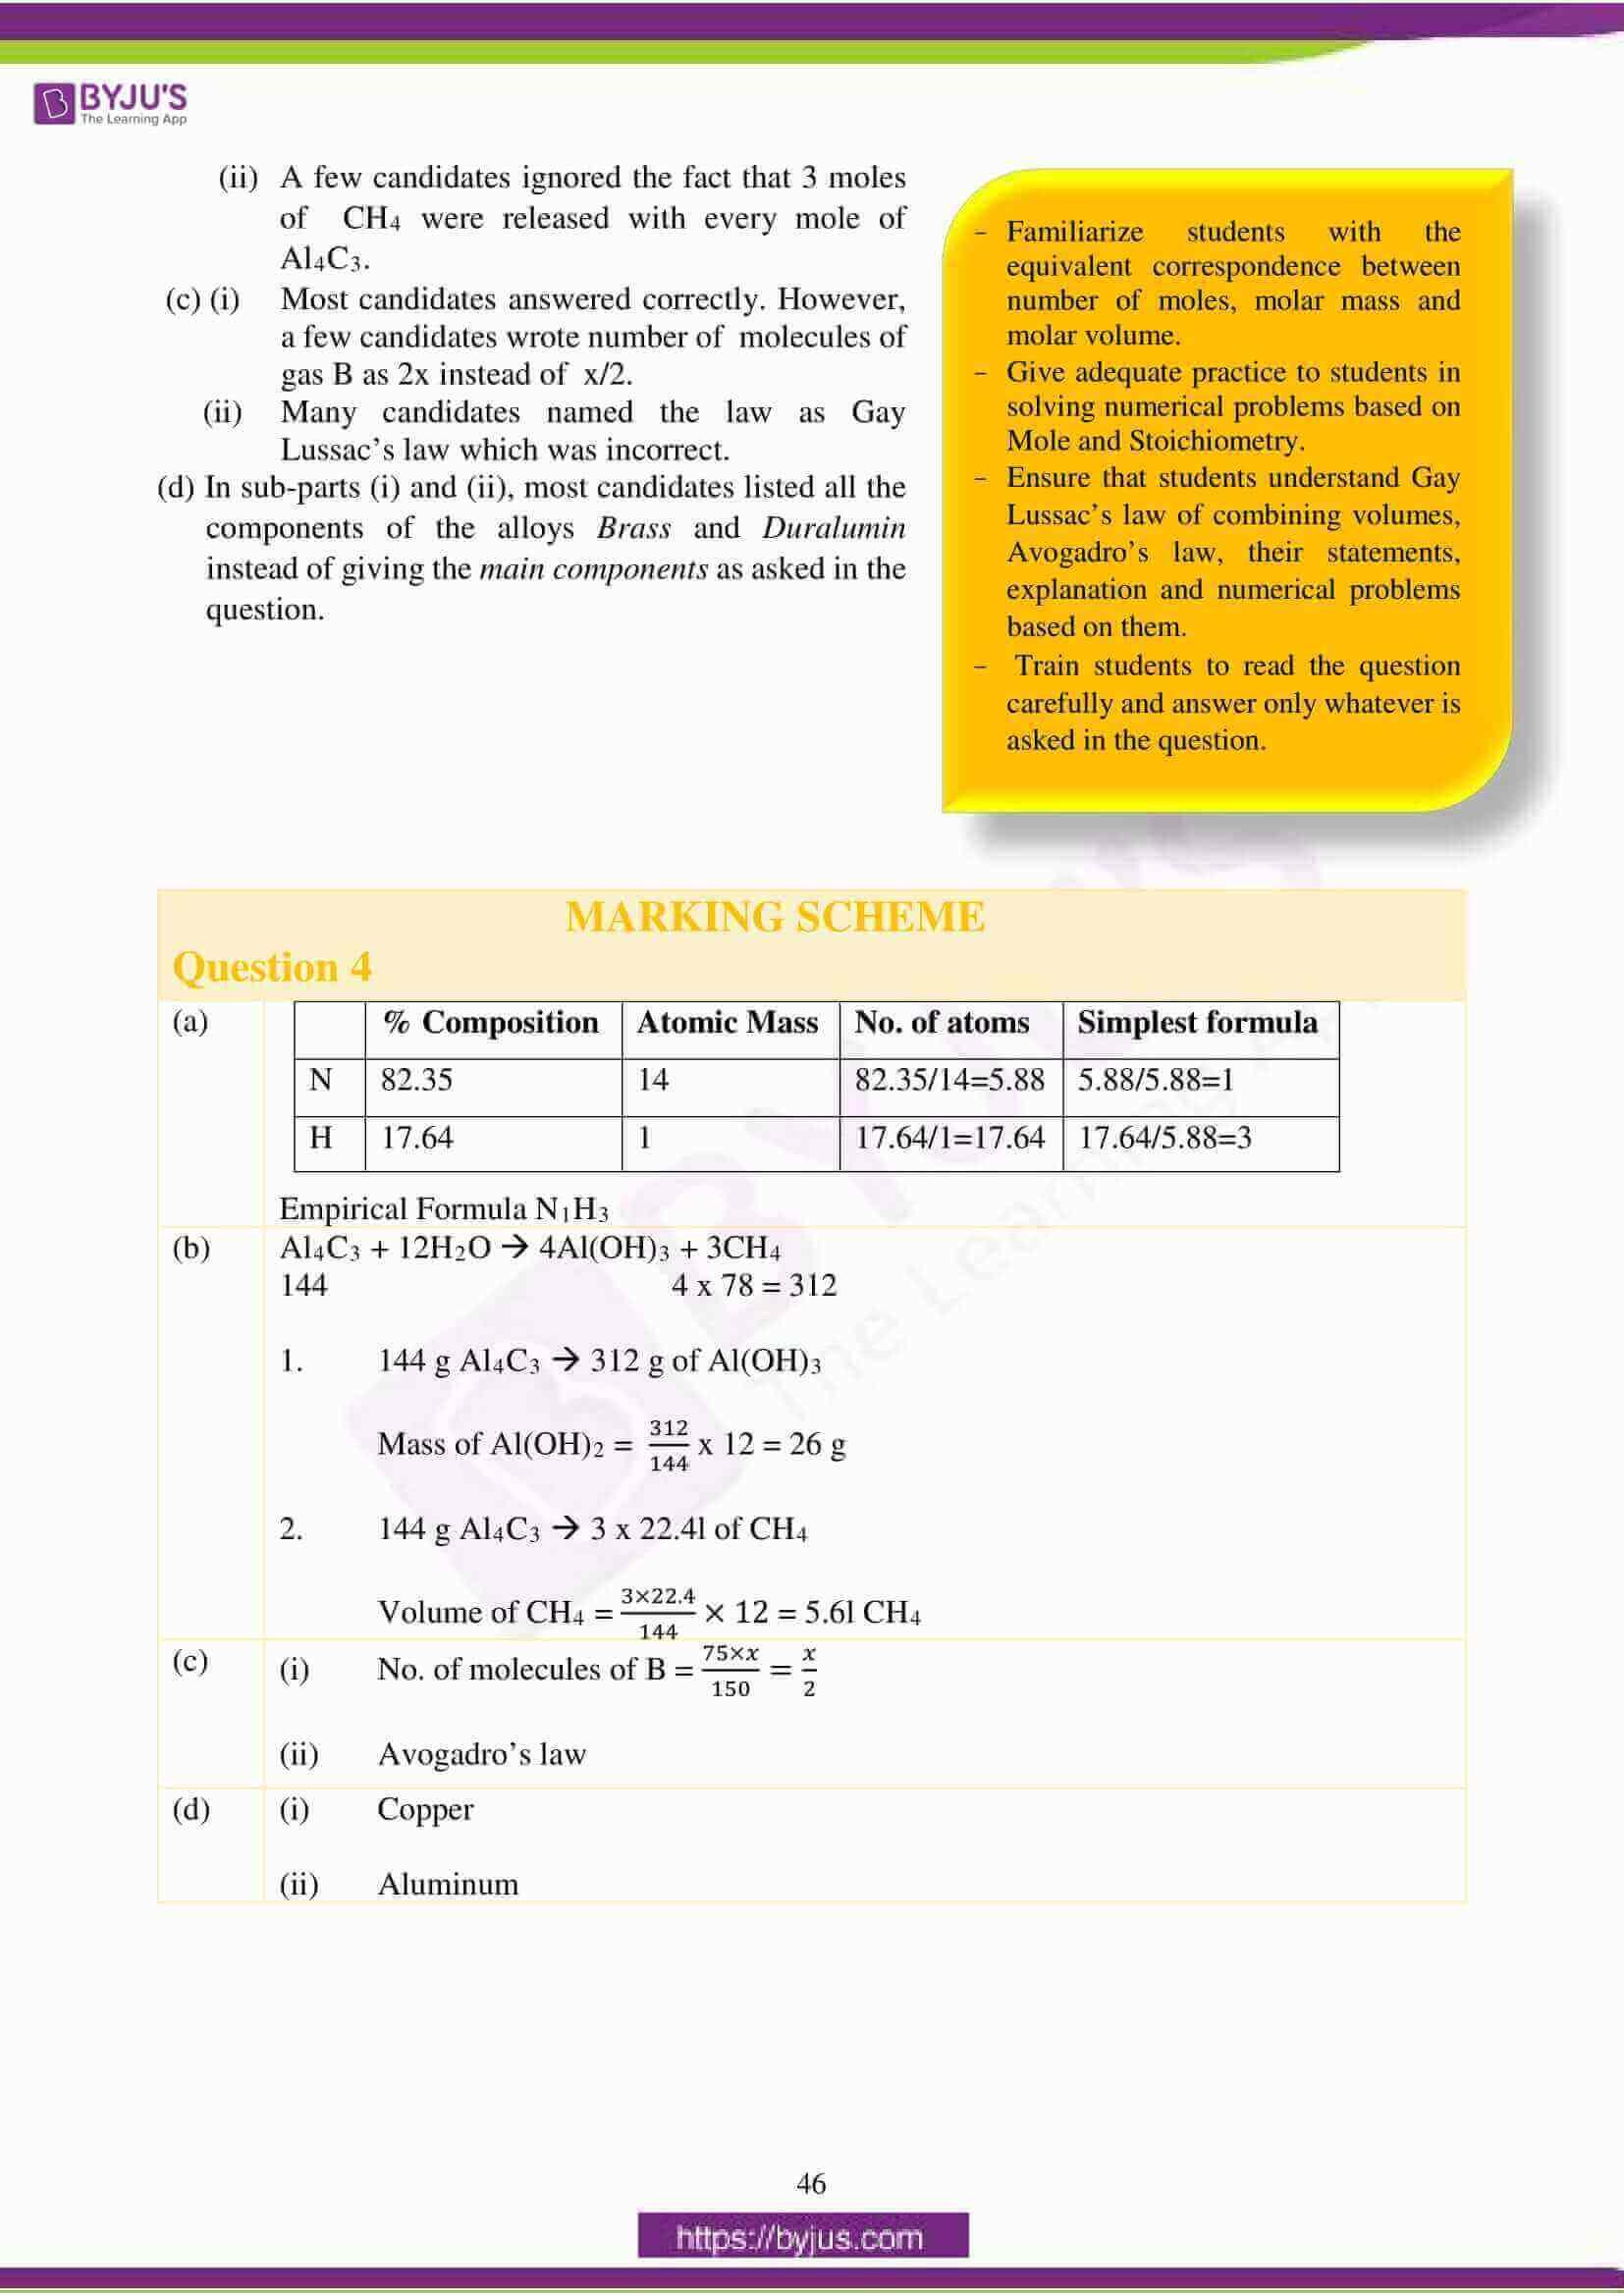 icse class 10 chemistry question paper solution 2018 13